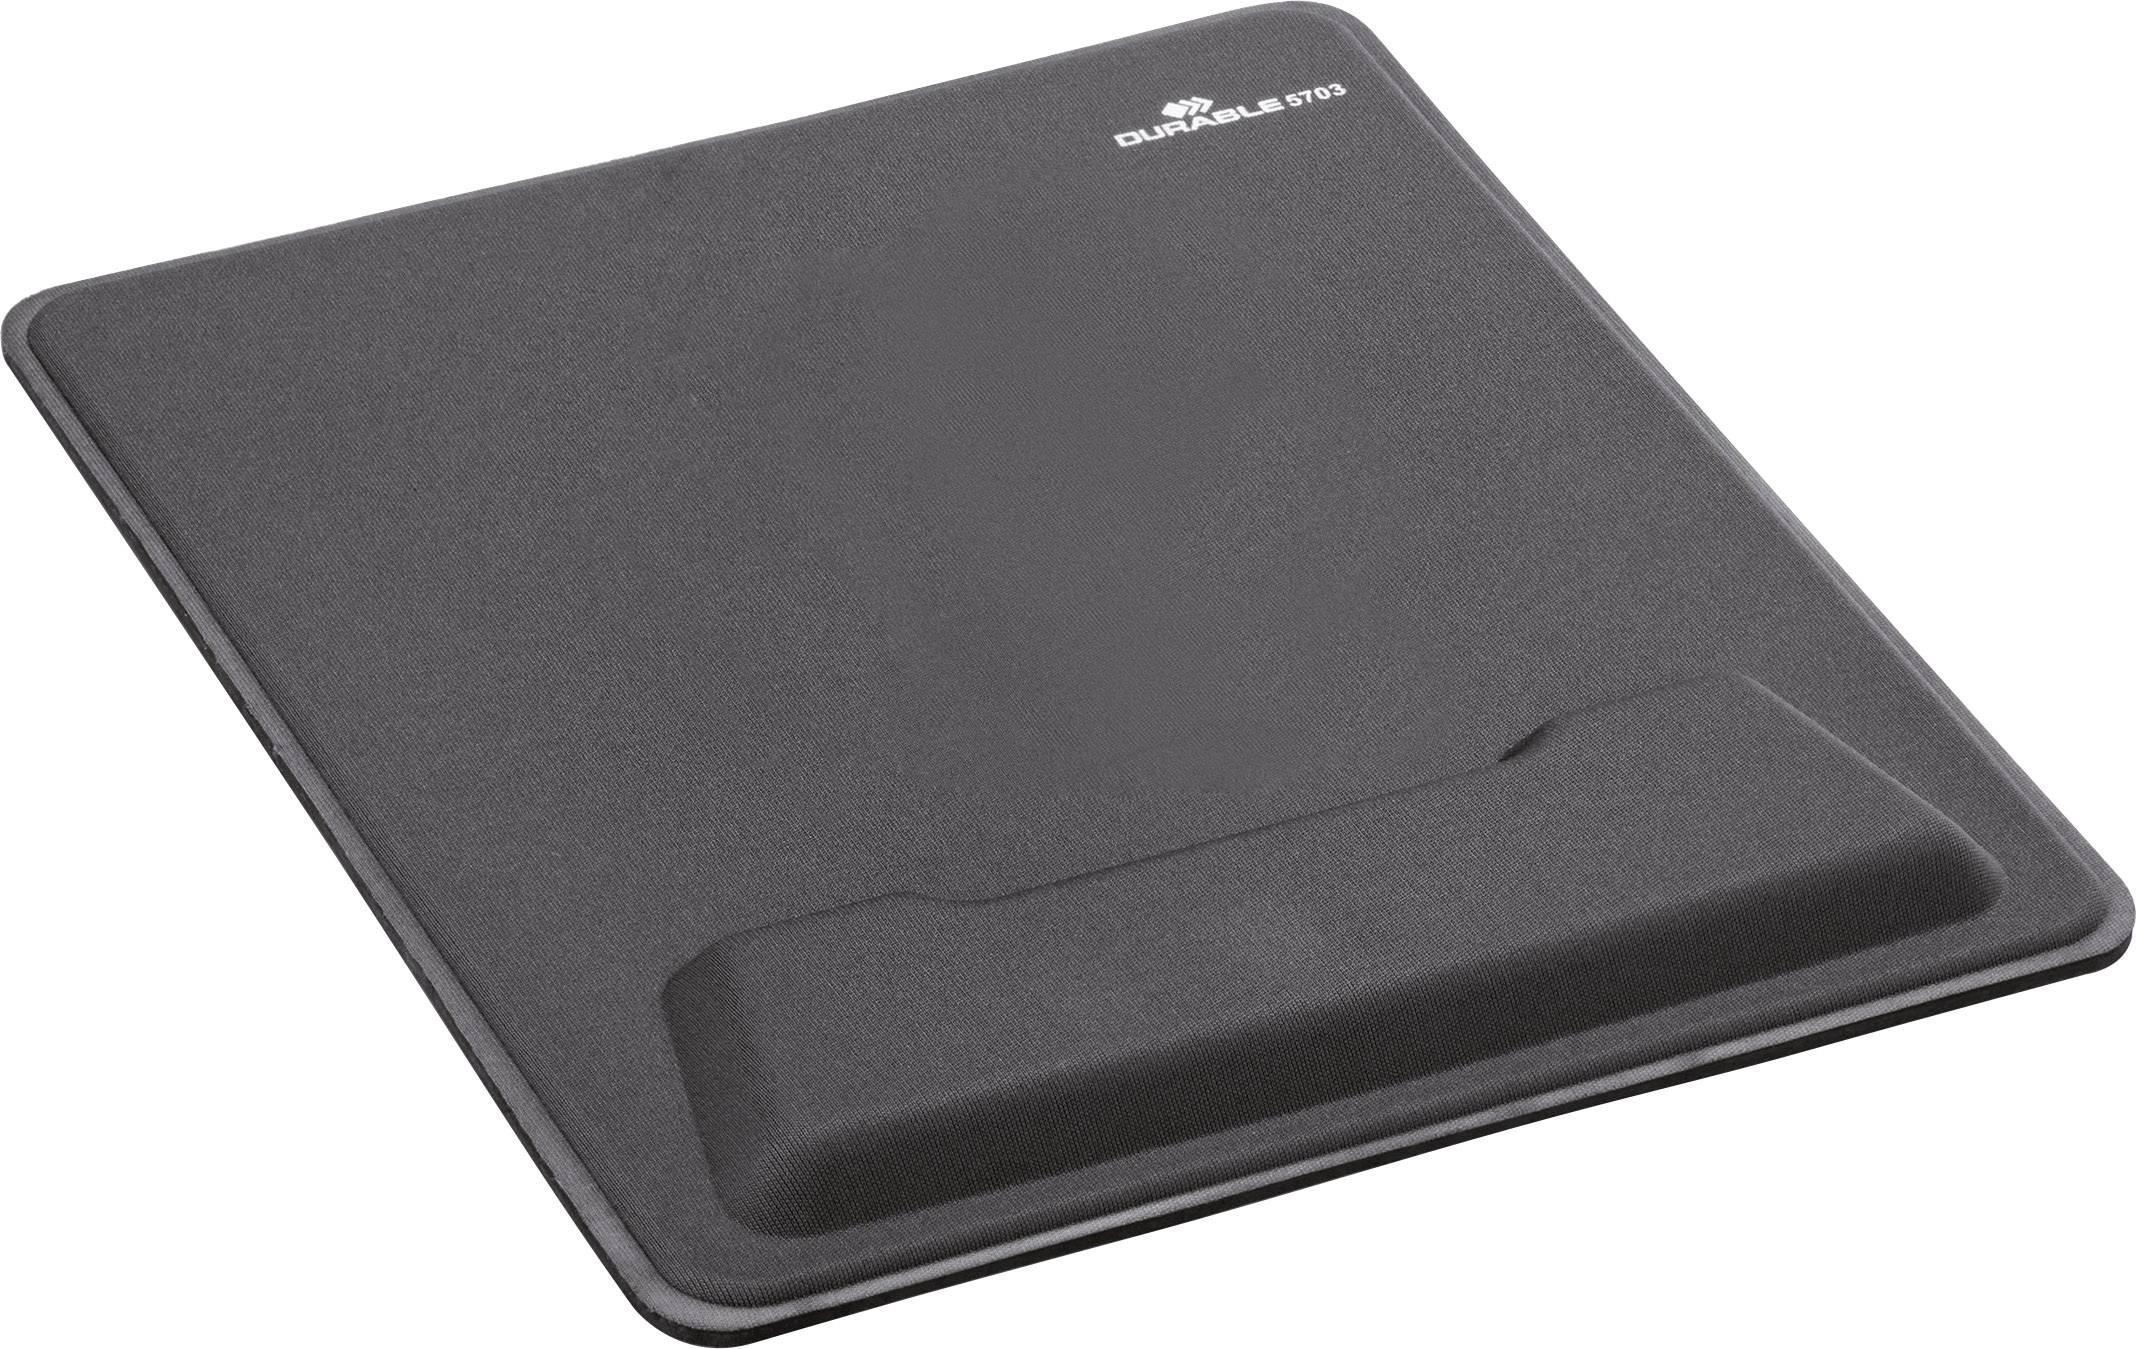 durable mouse pad ergotop 5703 mauspad handballenauflage anthrazit b x h x t 310 x 21 x 257mm